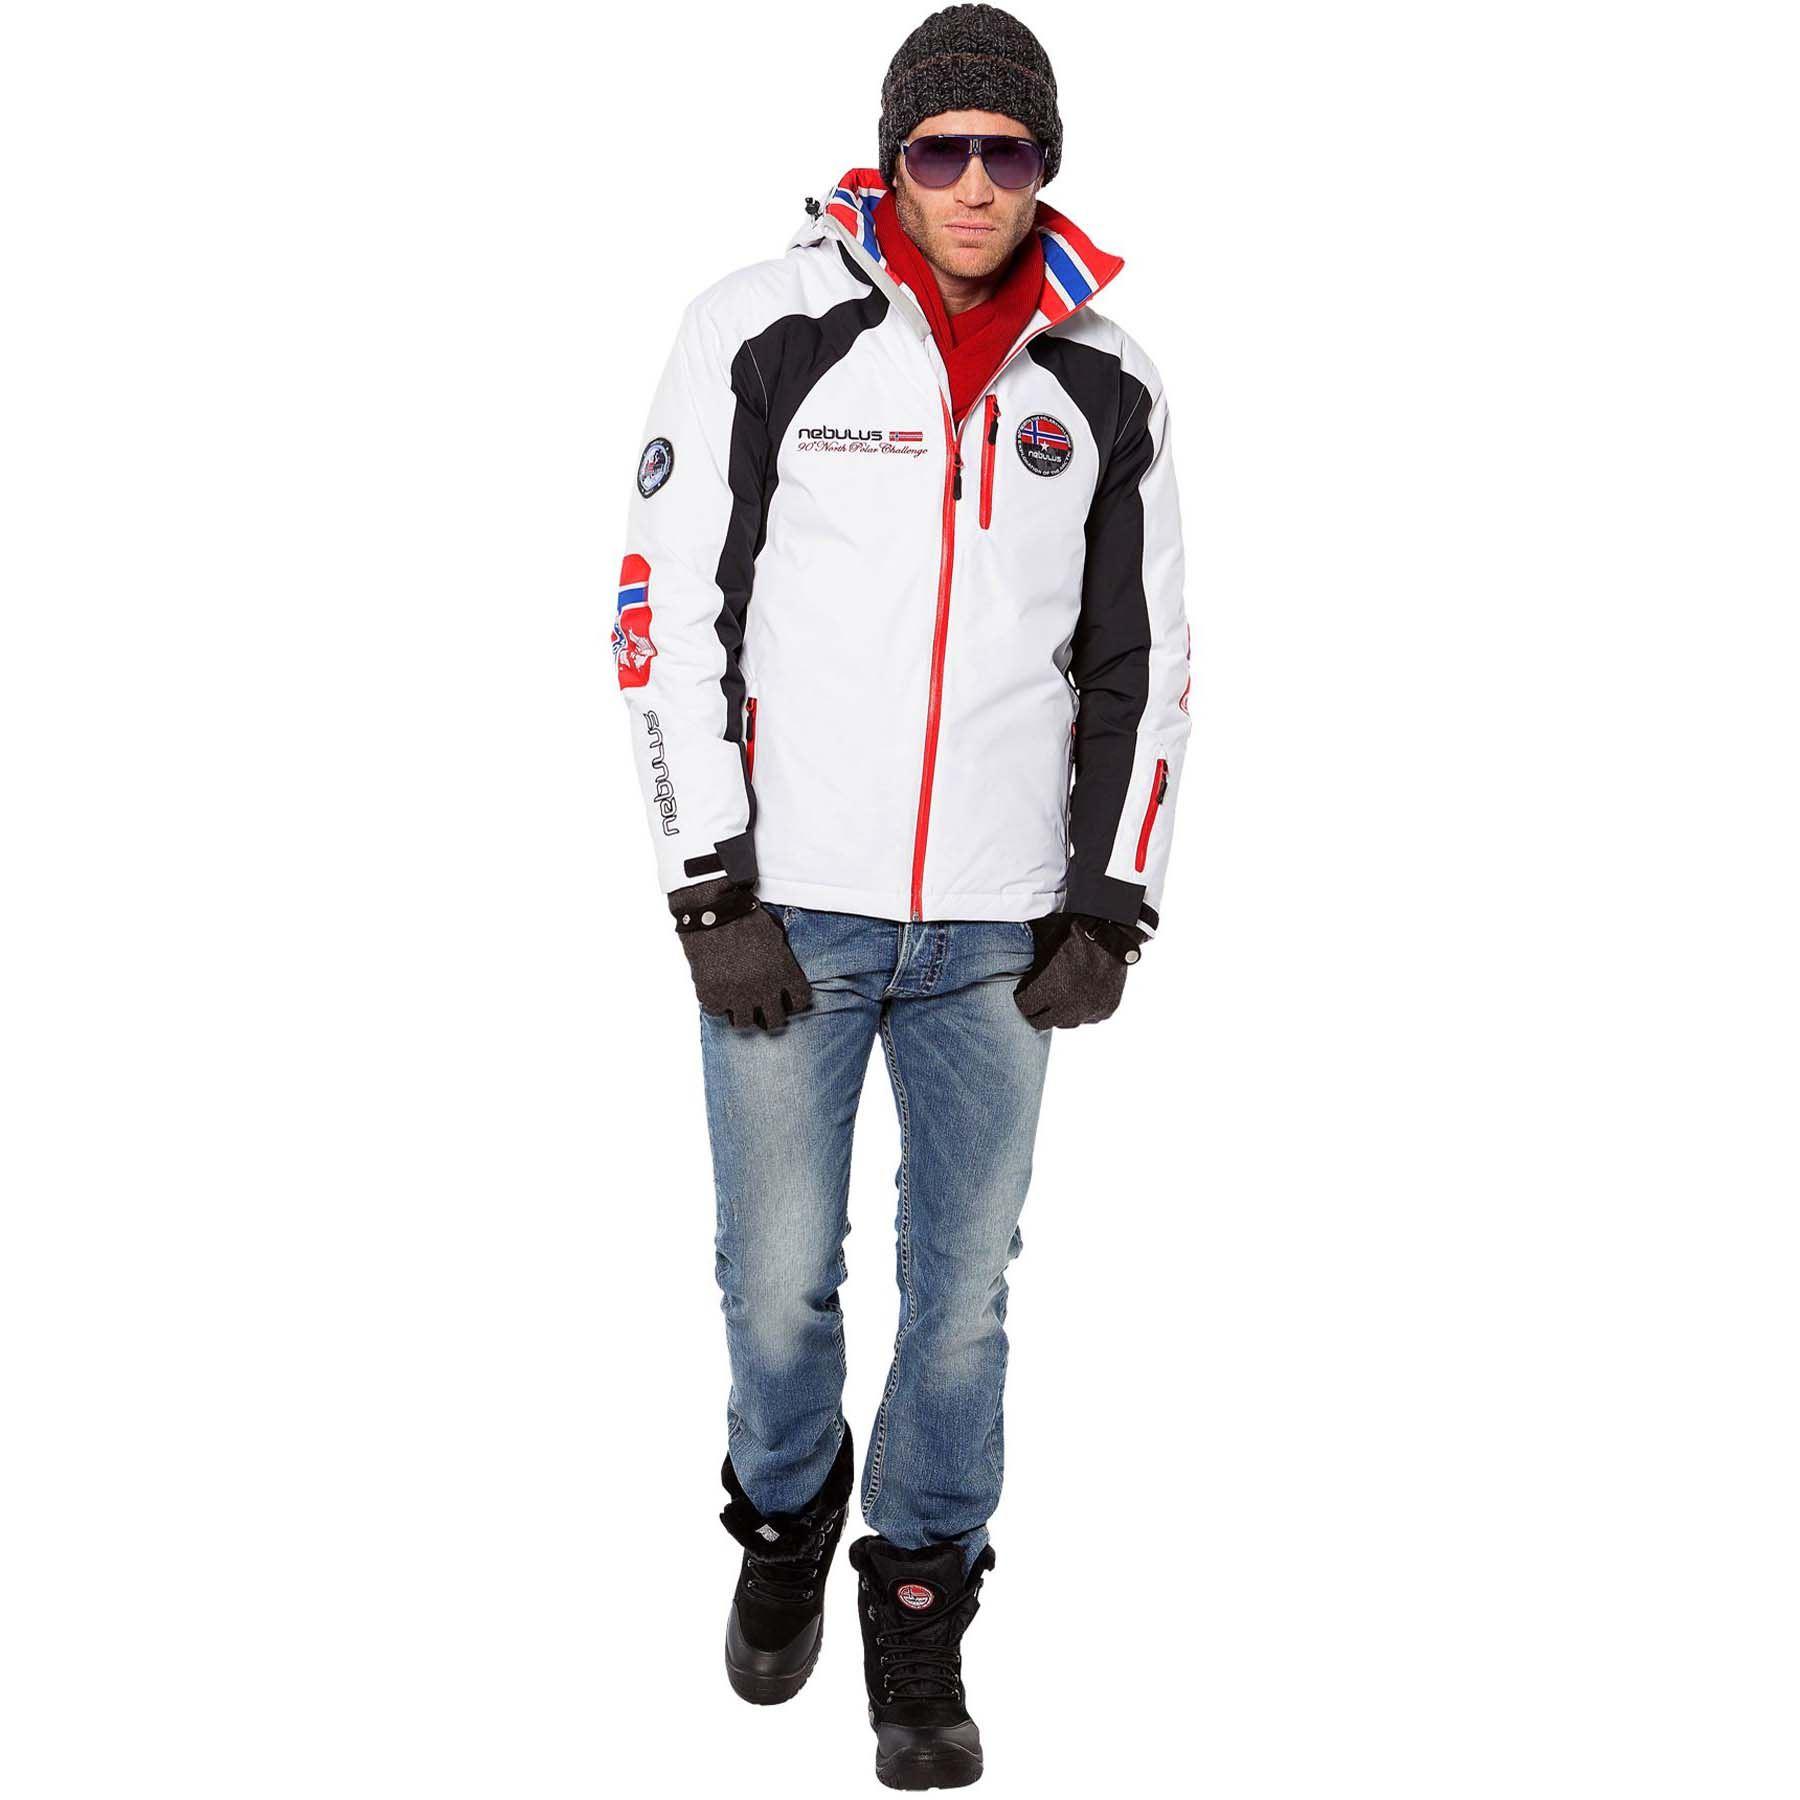 Nebulus Maestro Veste de ski Homme